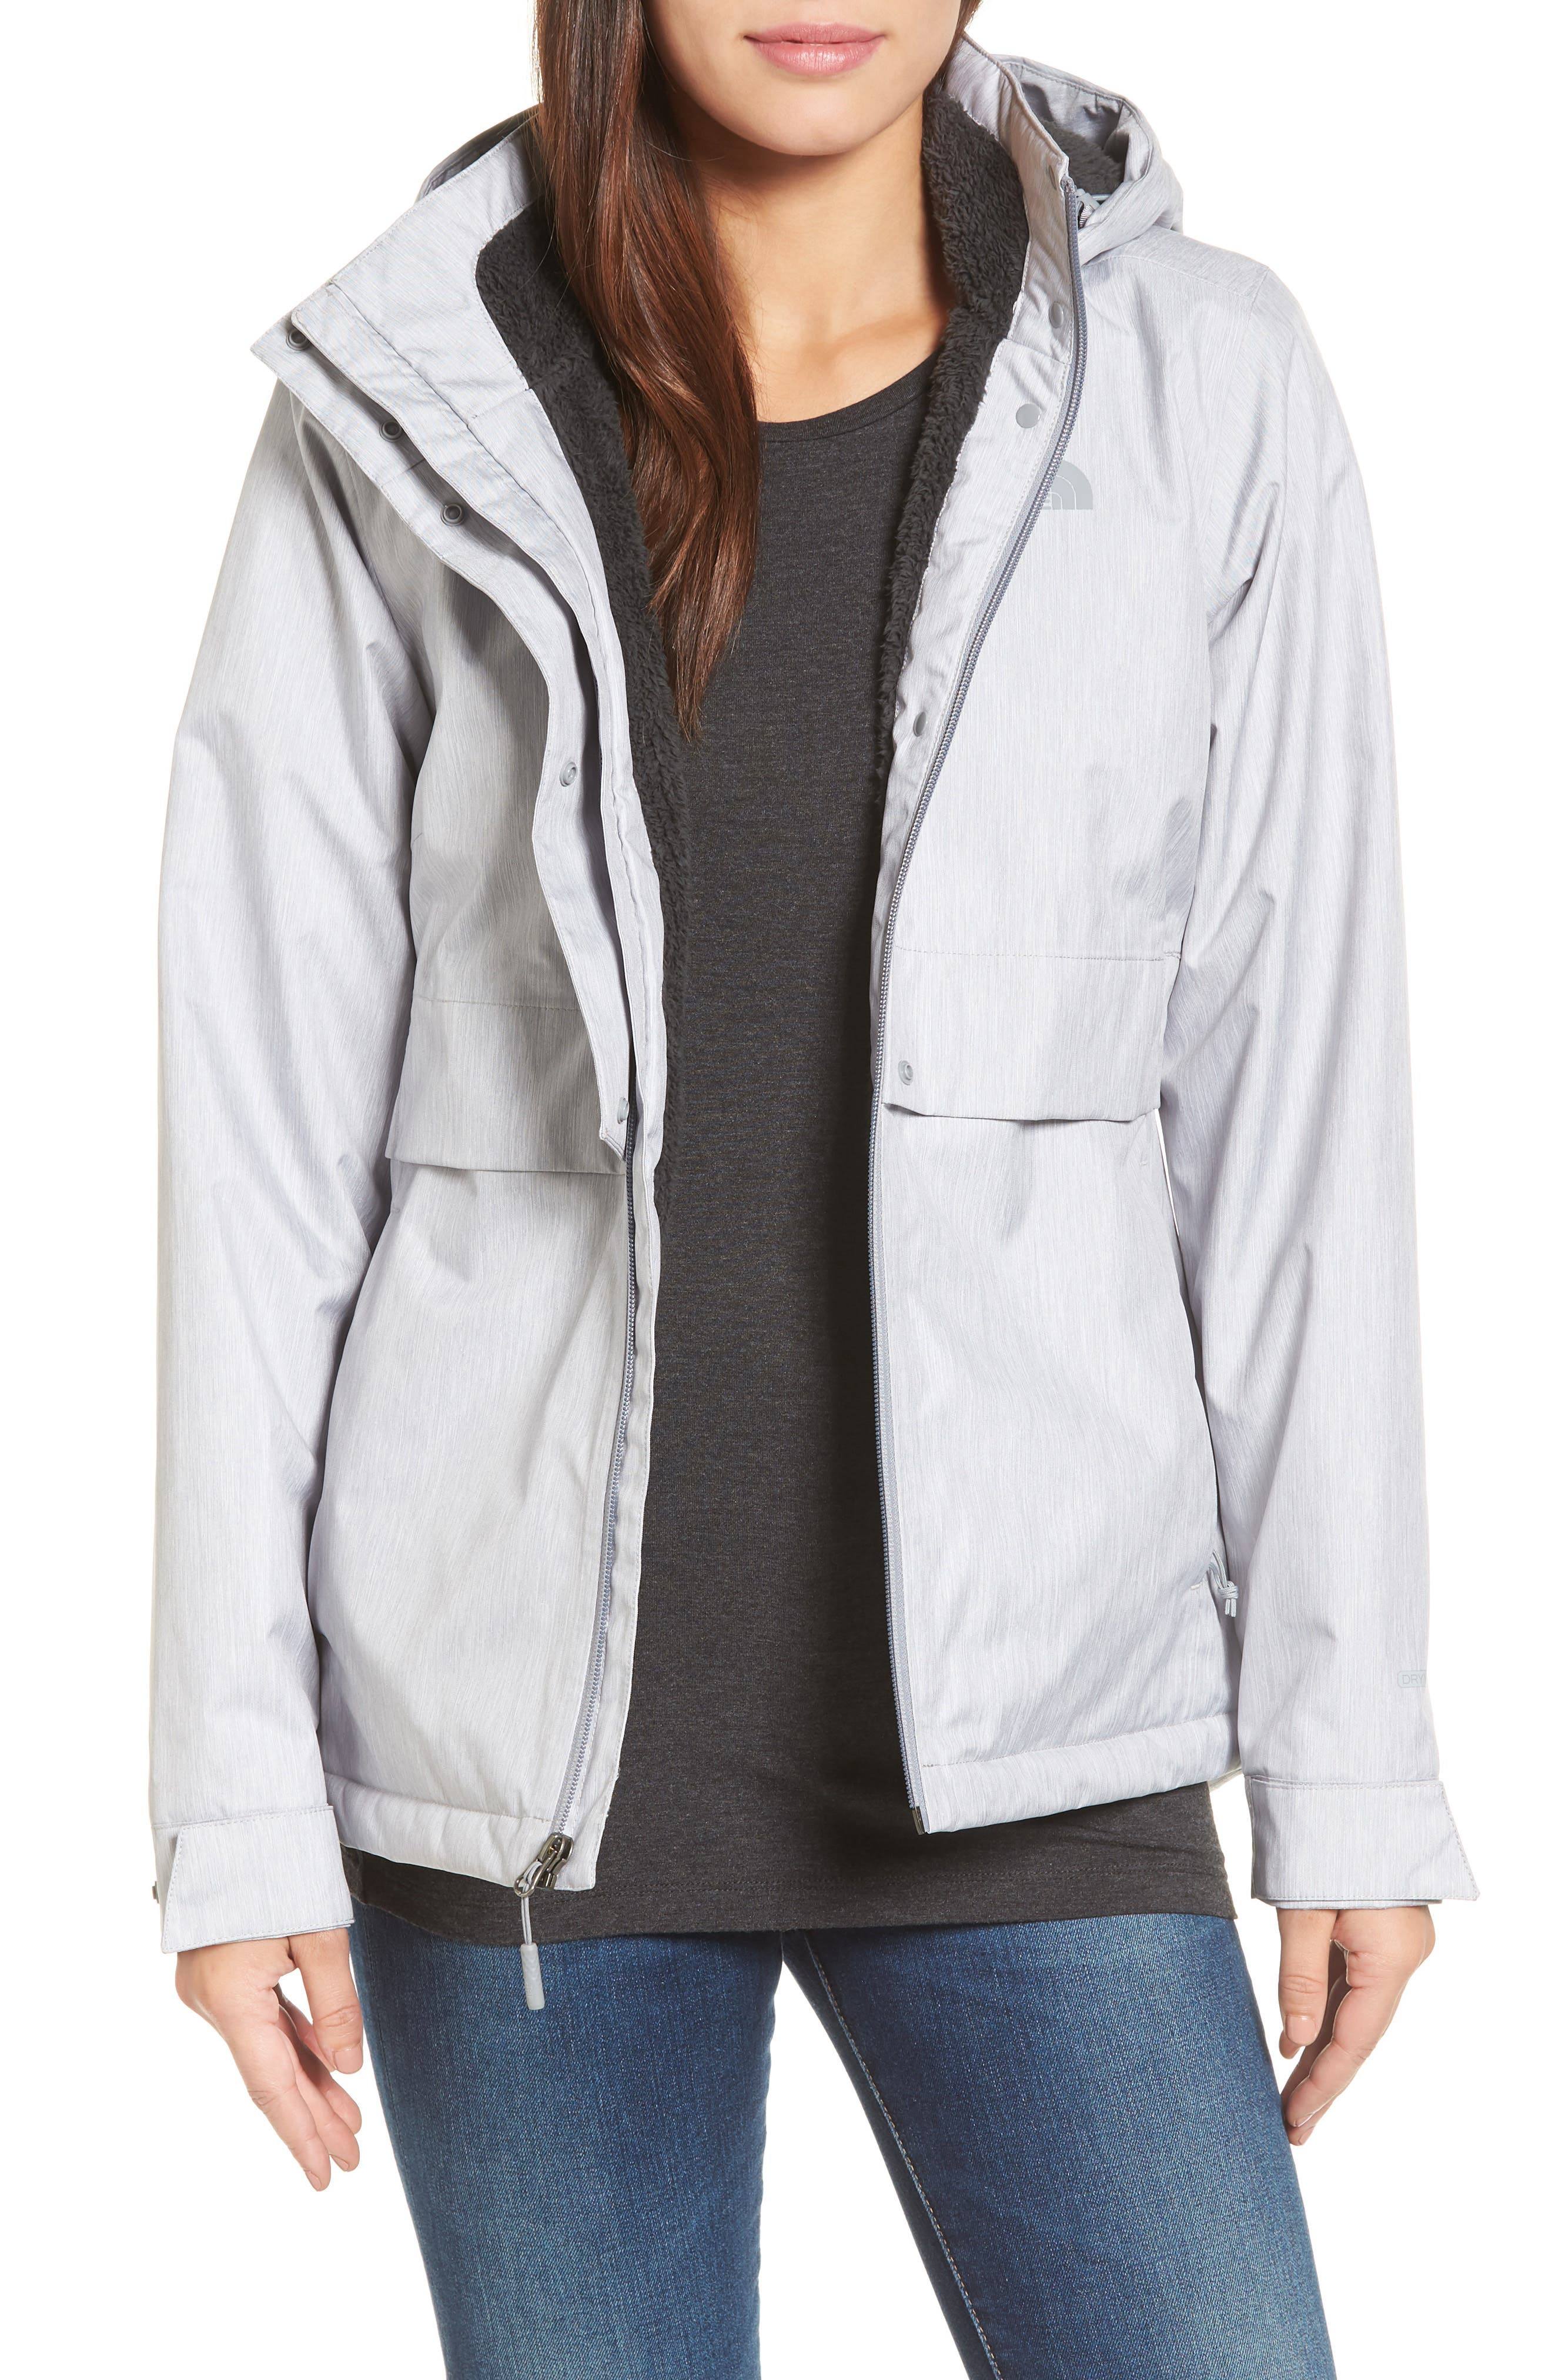 Main Image - The North Face Morialta Jacket